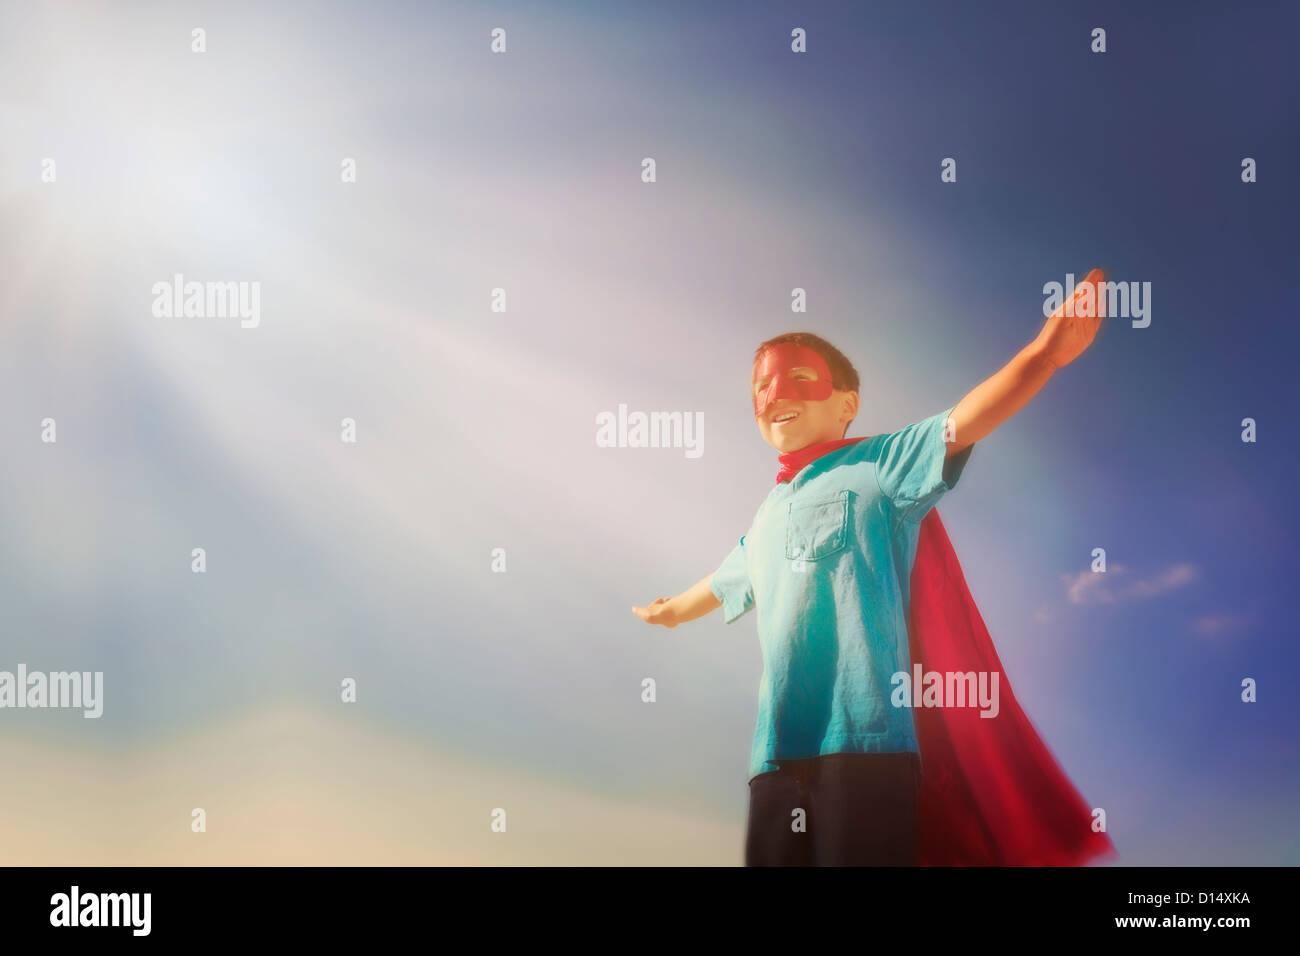 USA, New Jersey, Jersey City, Boy (6-7) in superhero costume under blue sky - Stock Image